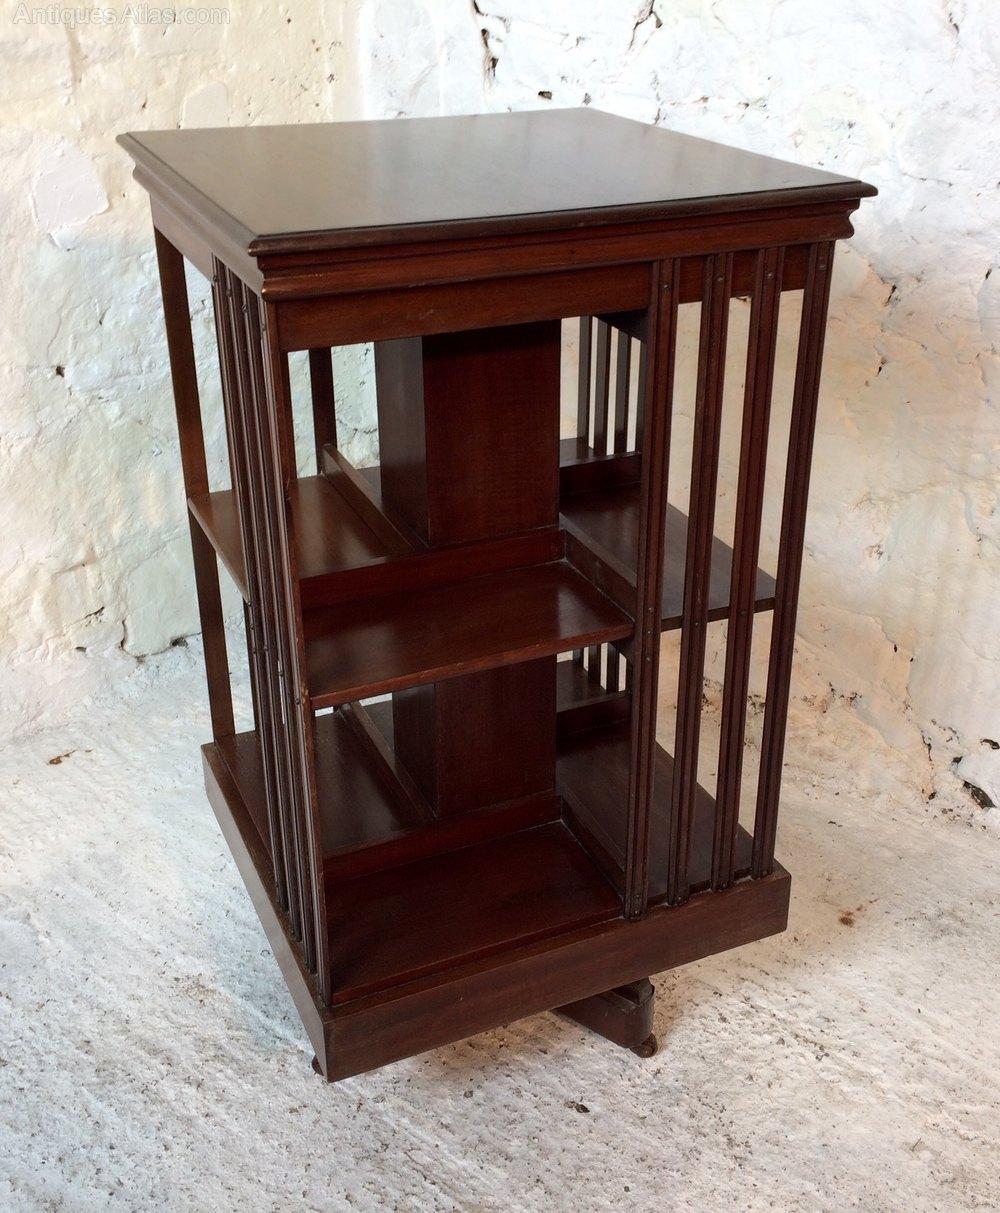 Rotating Bookshelves: Victorian Mahogany Revolving Bookcase